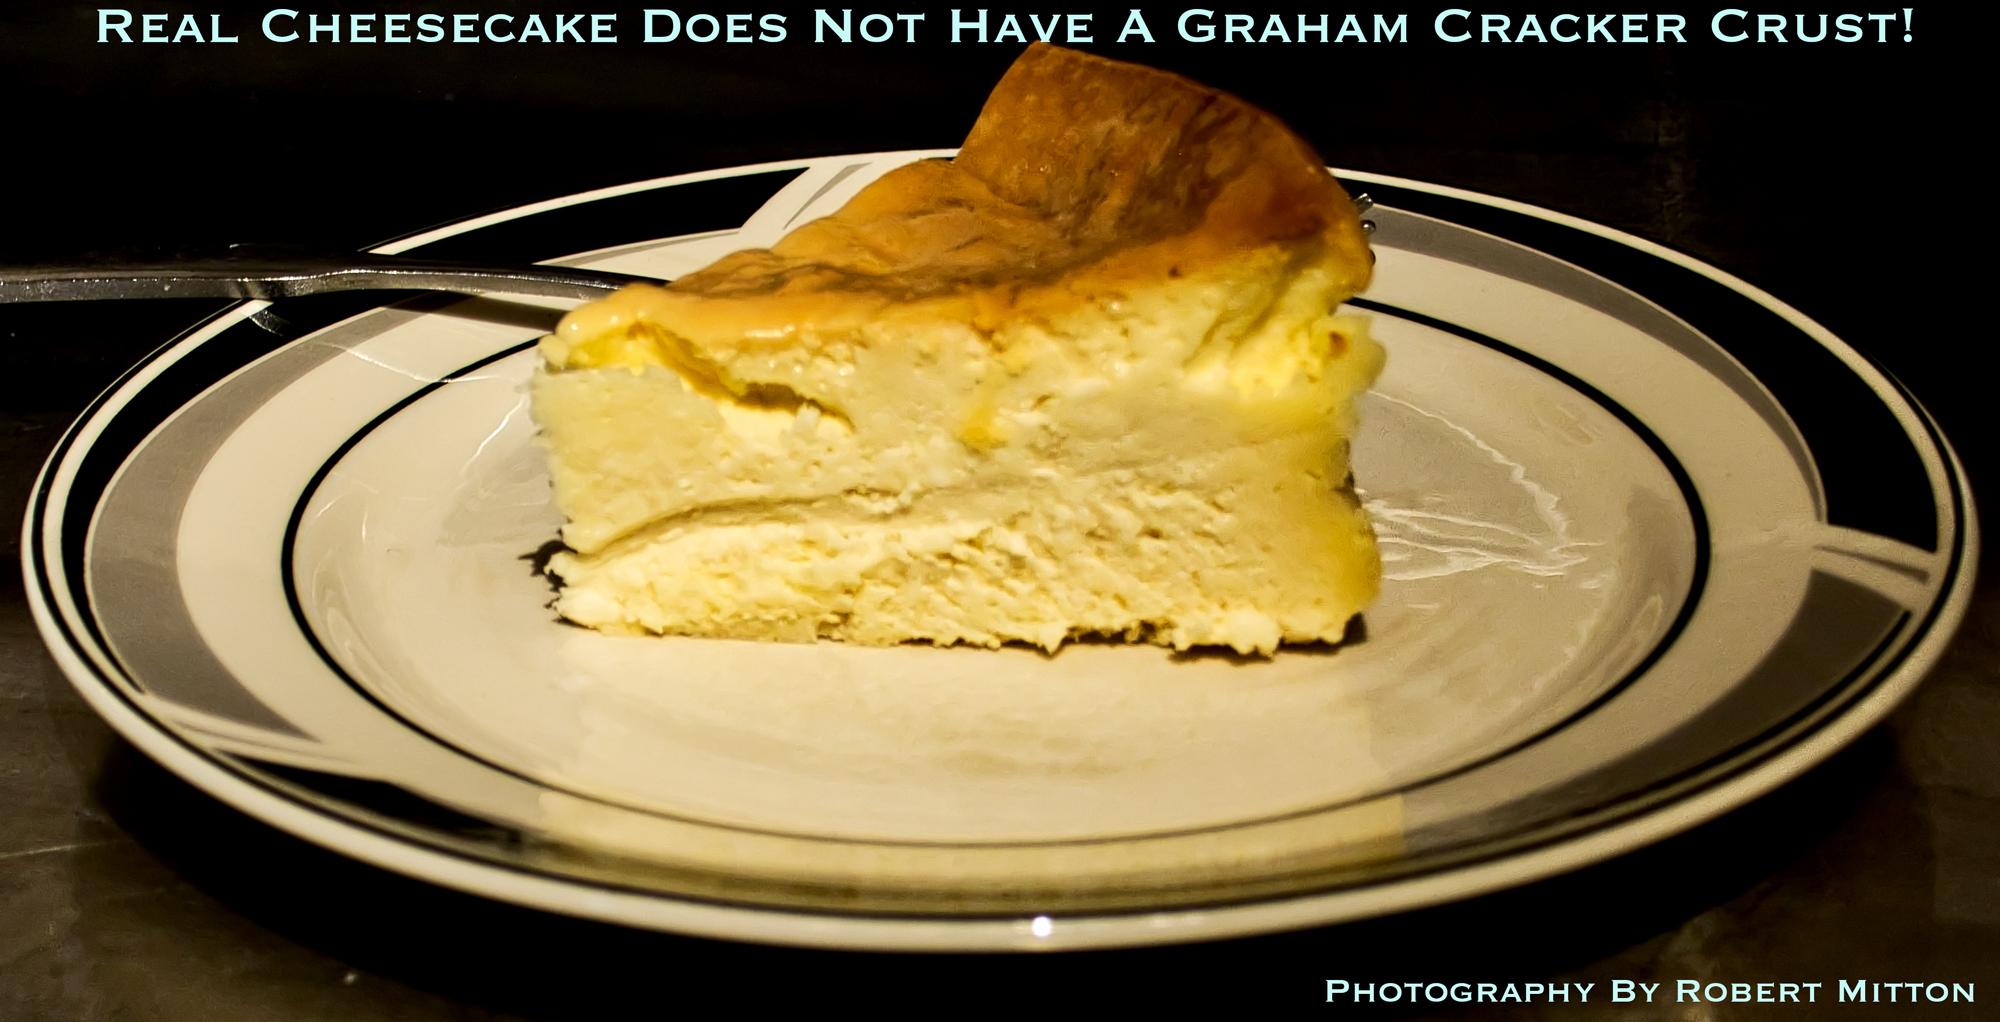 Amish style cheesecake